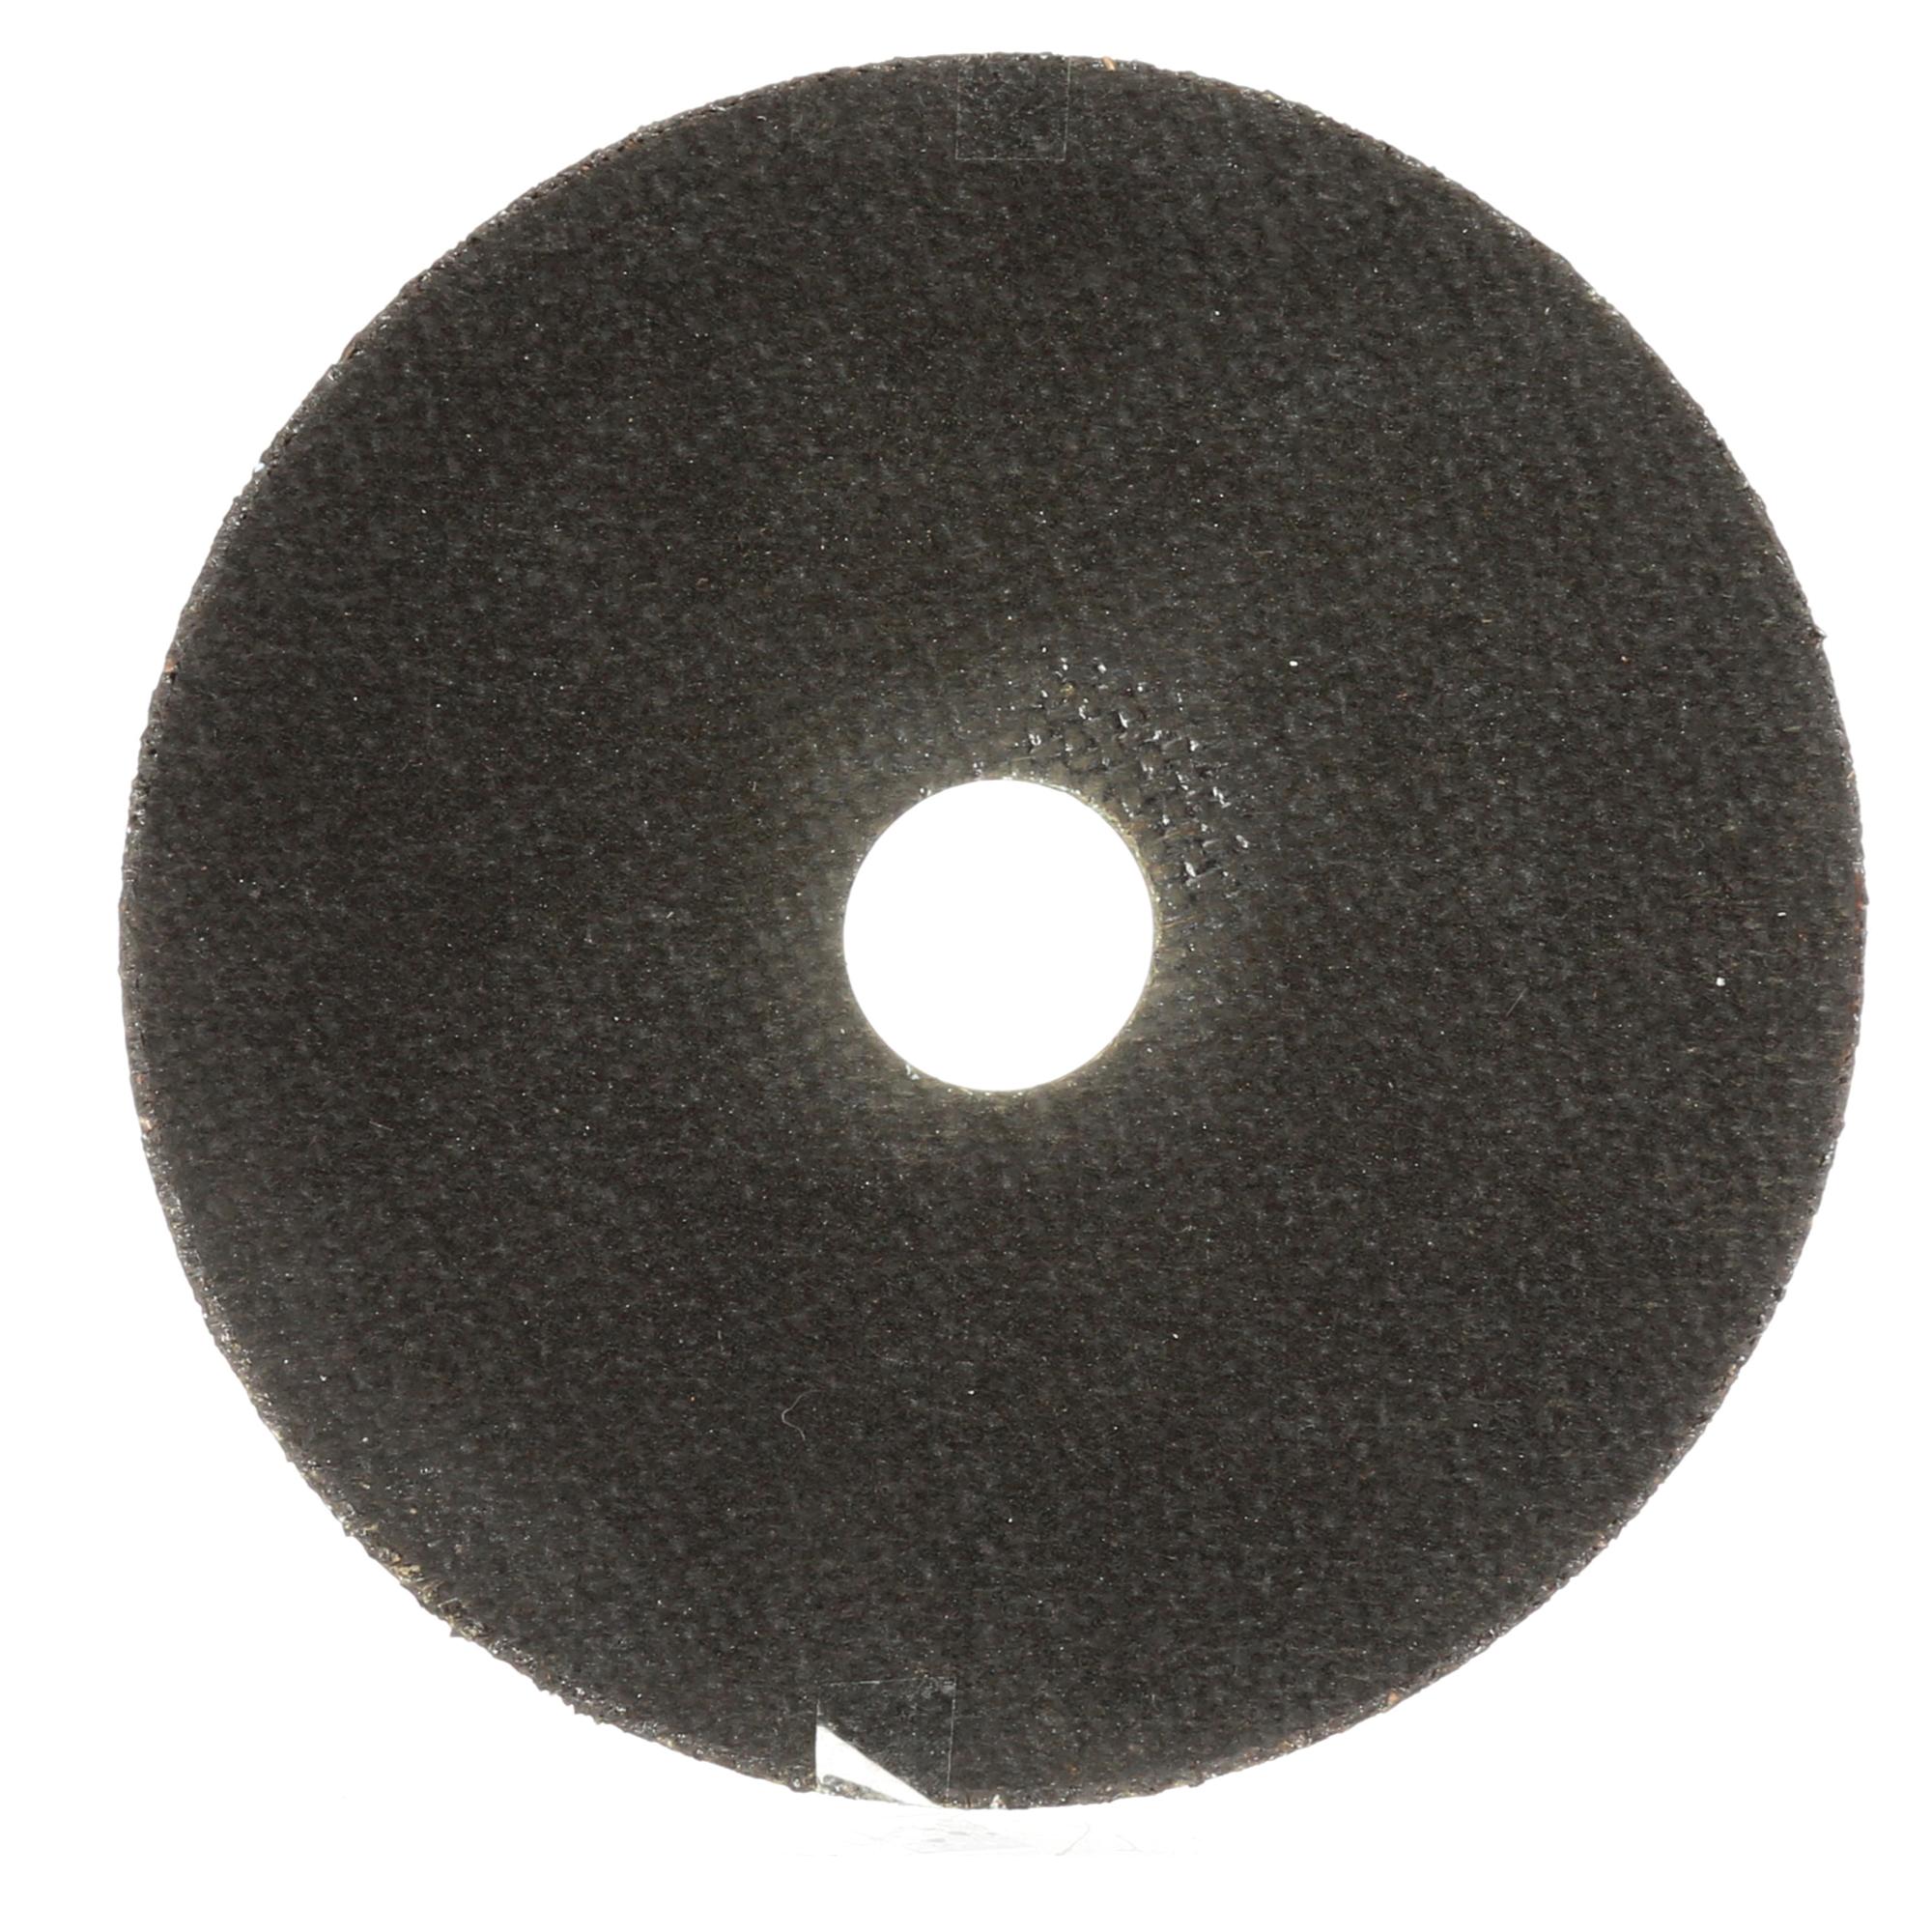 Cubitron™ II Hookit™ 051125-86842 732U Open Coated Abrasive Abrasive Disc, 5 in Dia Disc, 80+ Grit, Ceramic Alumina Abrasive, Paper Backing